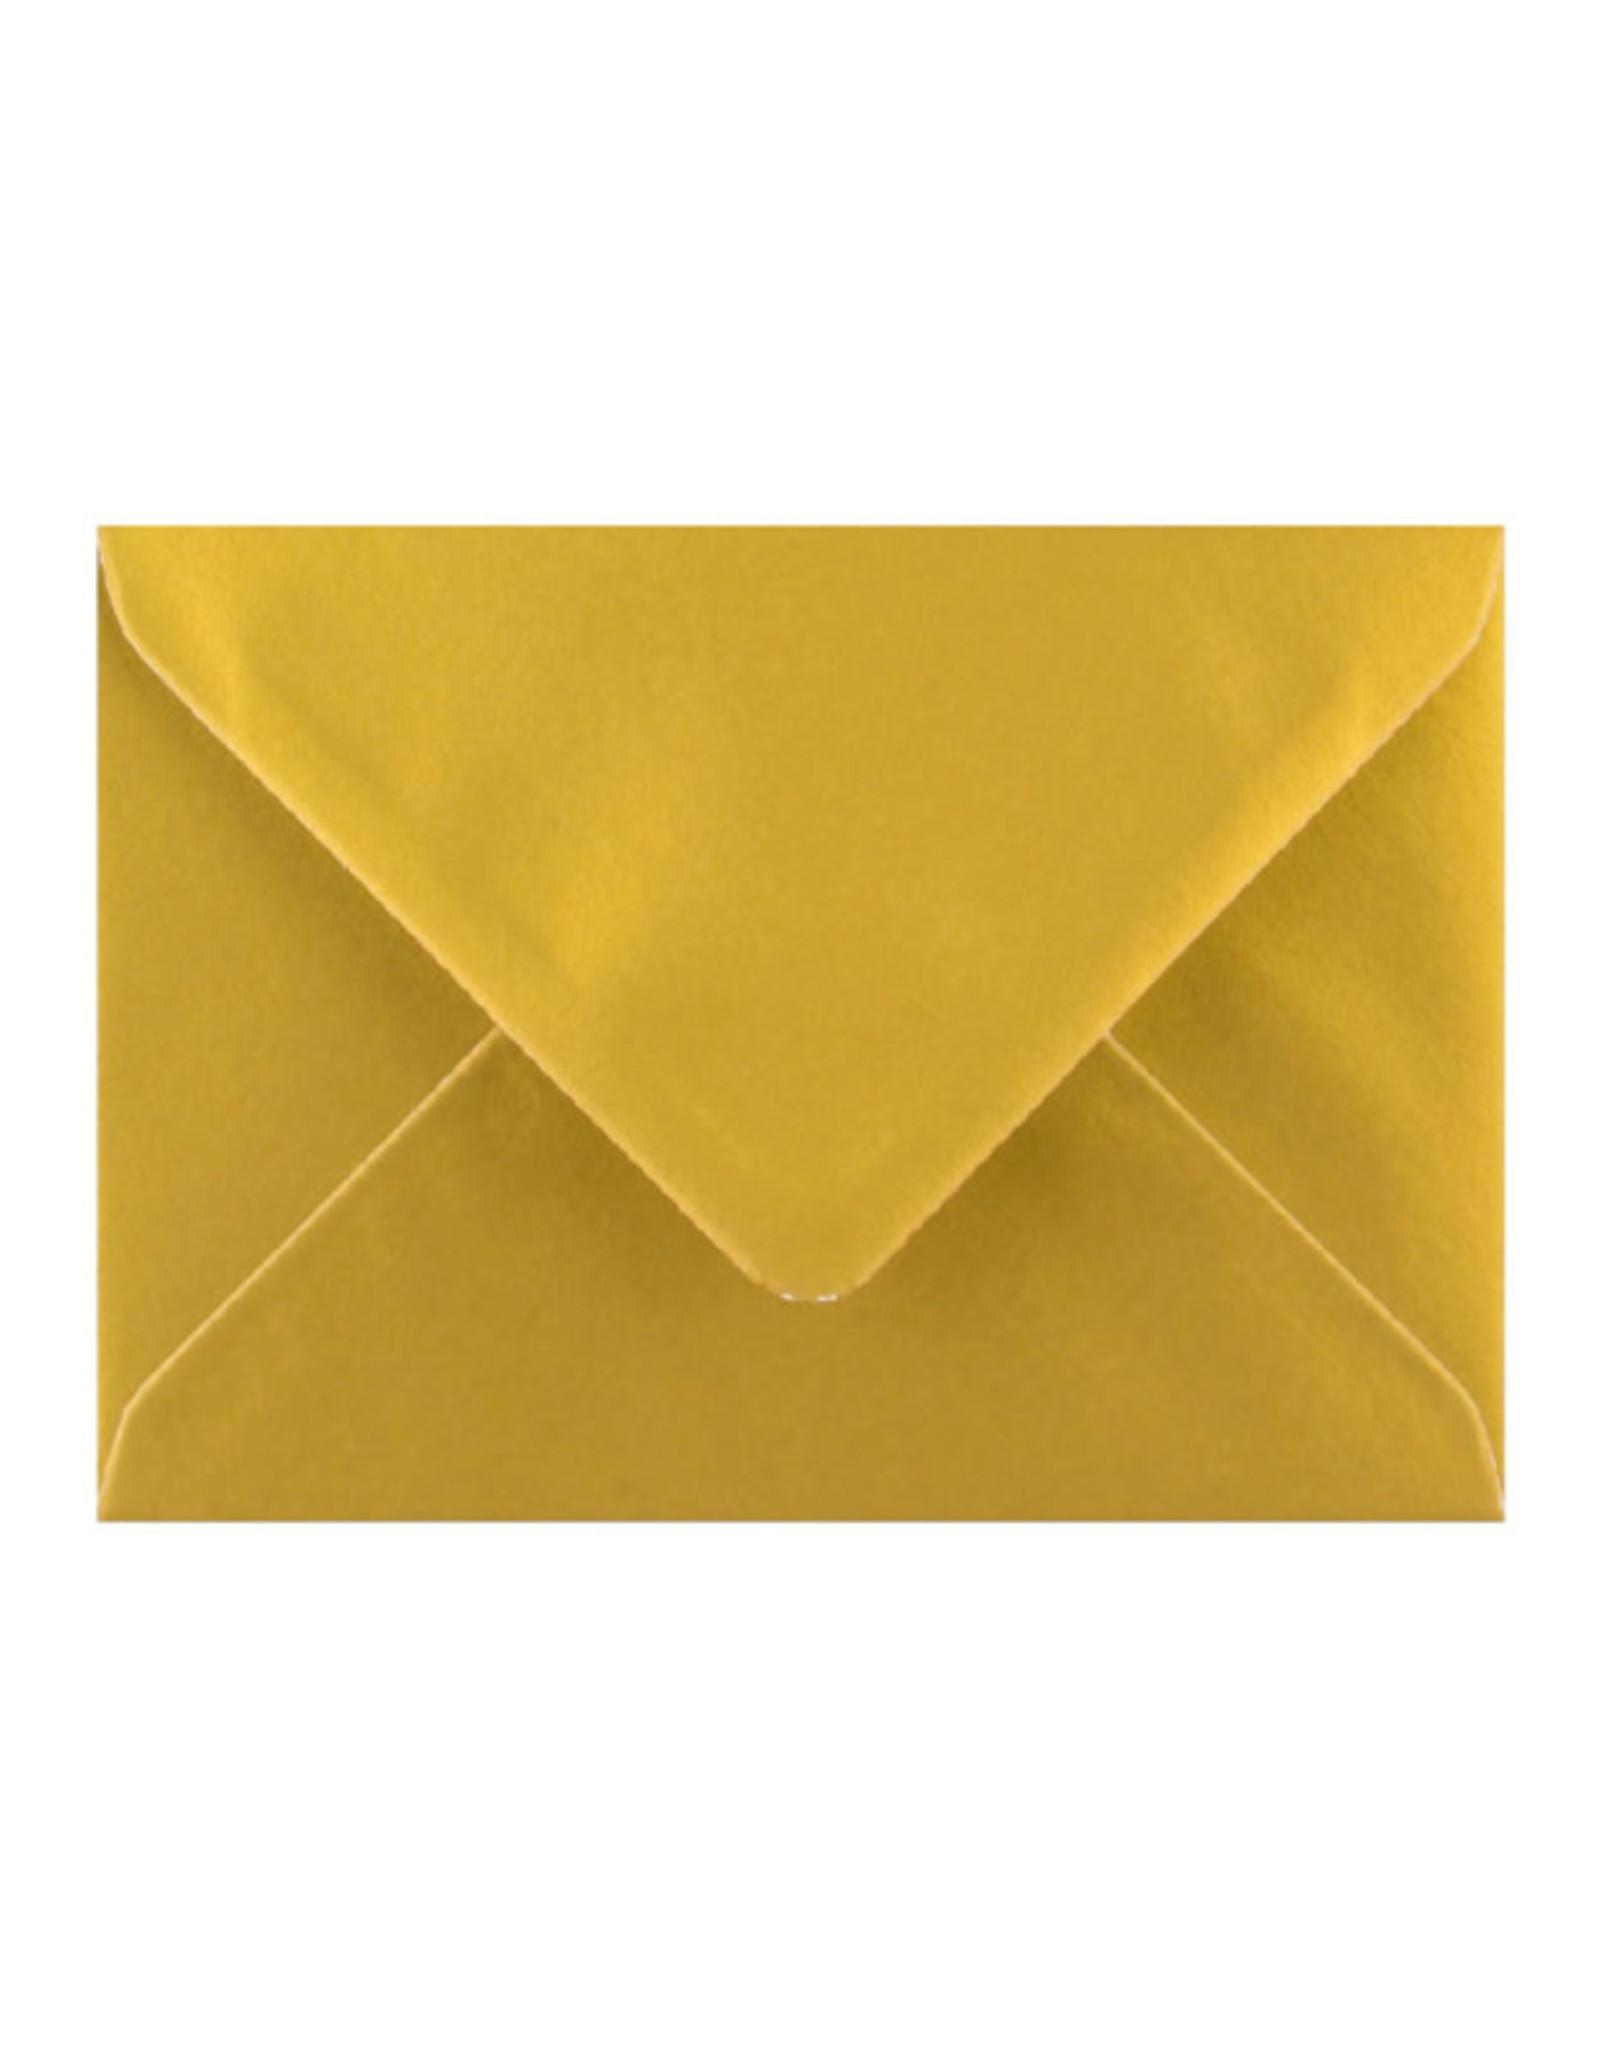 By romi by romi kaart a6 + gouden envelop: soms heb je wat extra liefde nodig